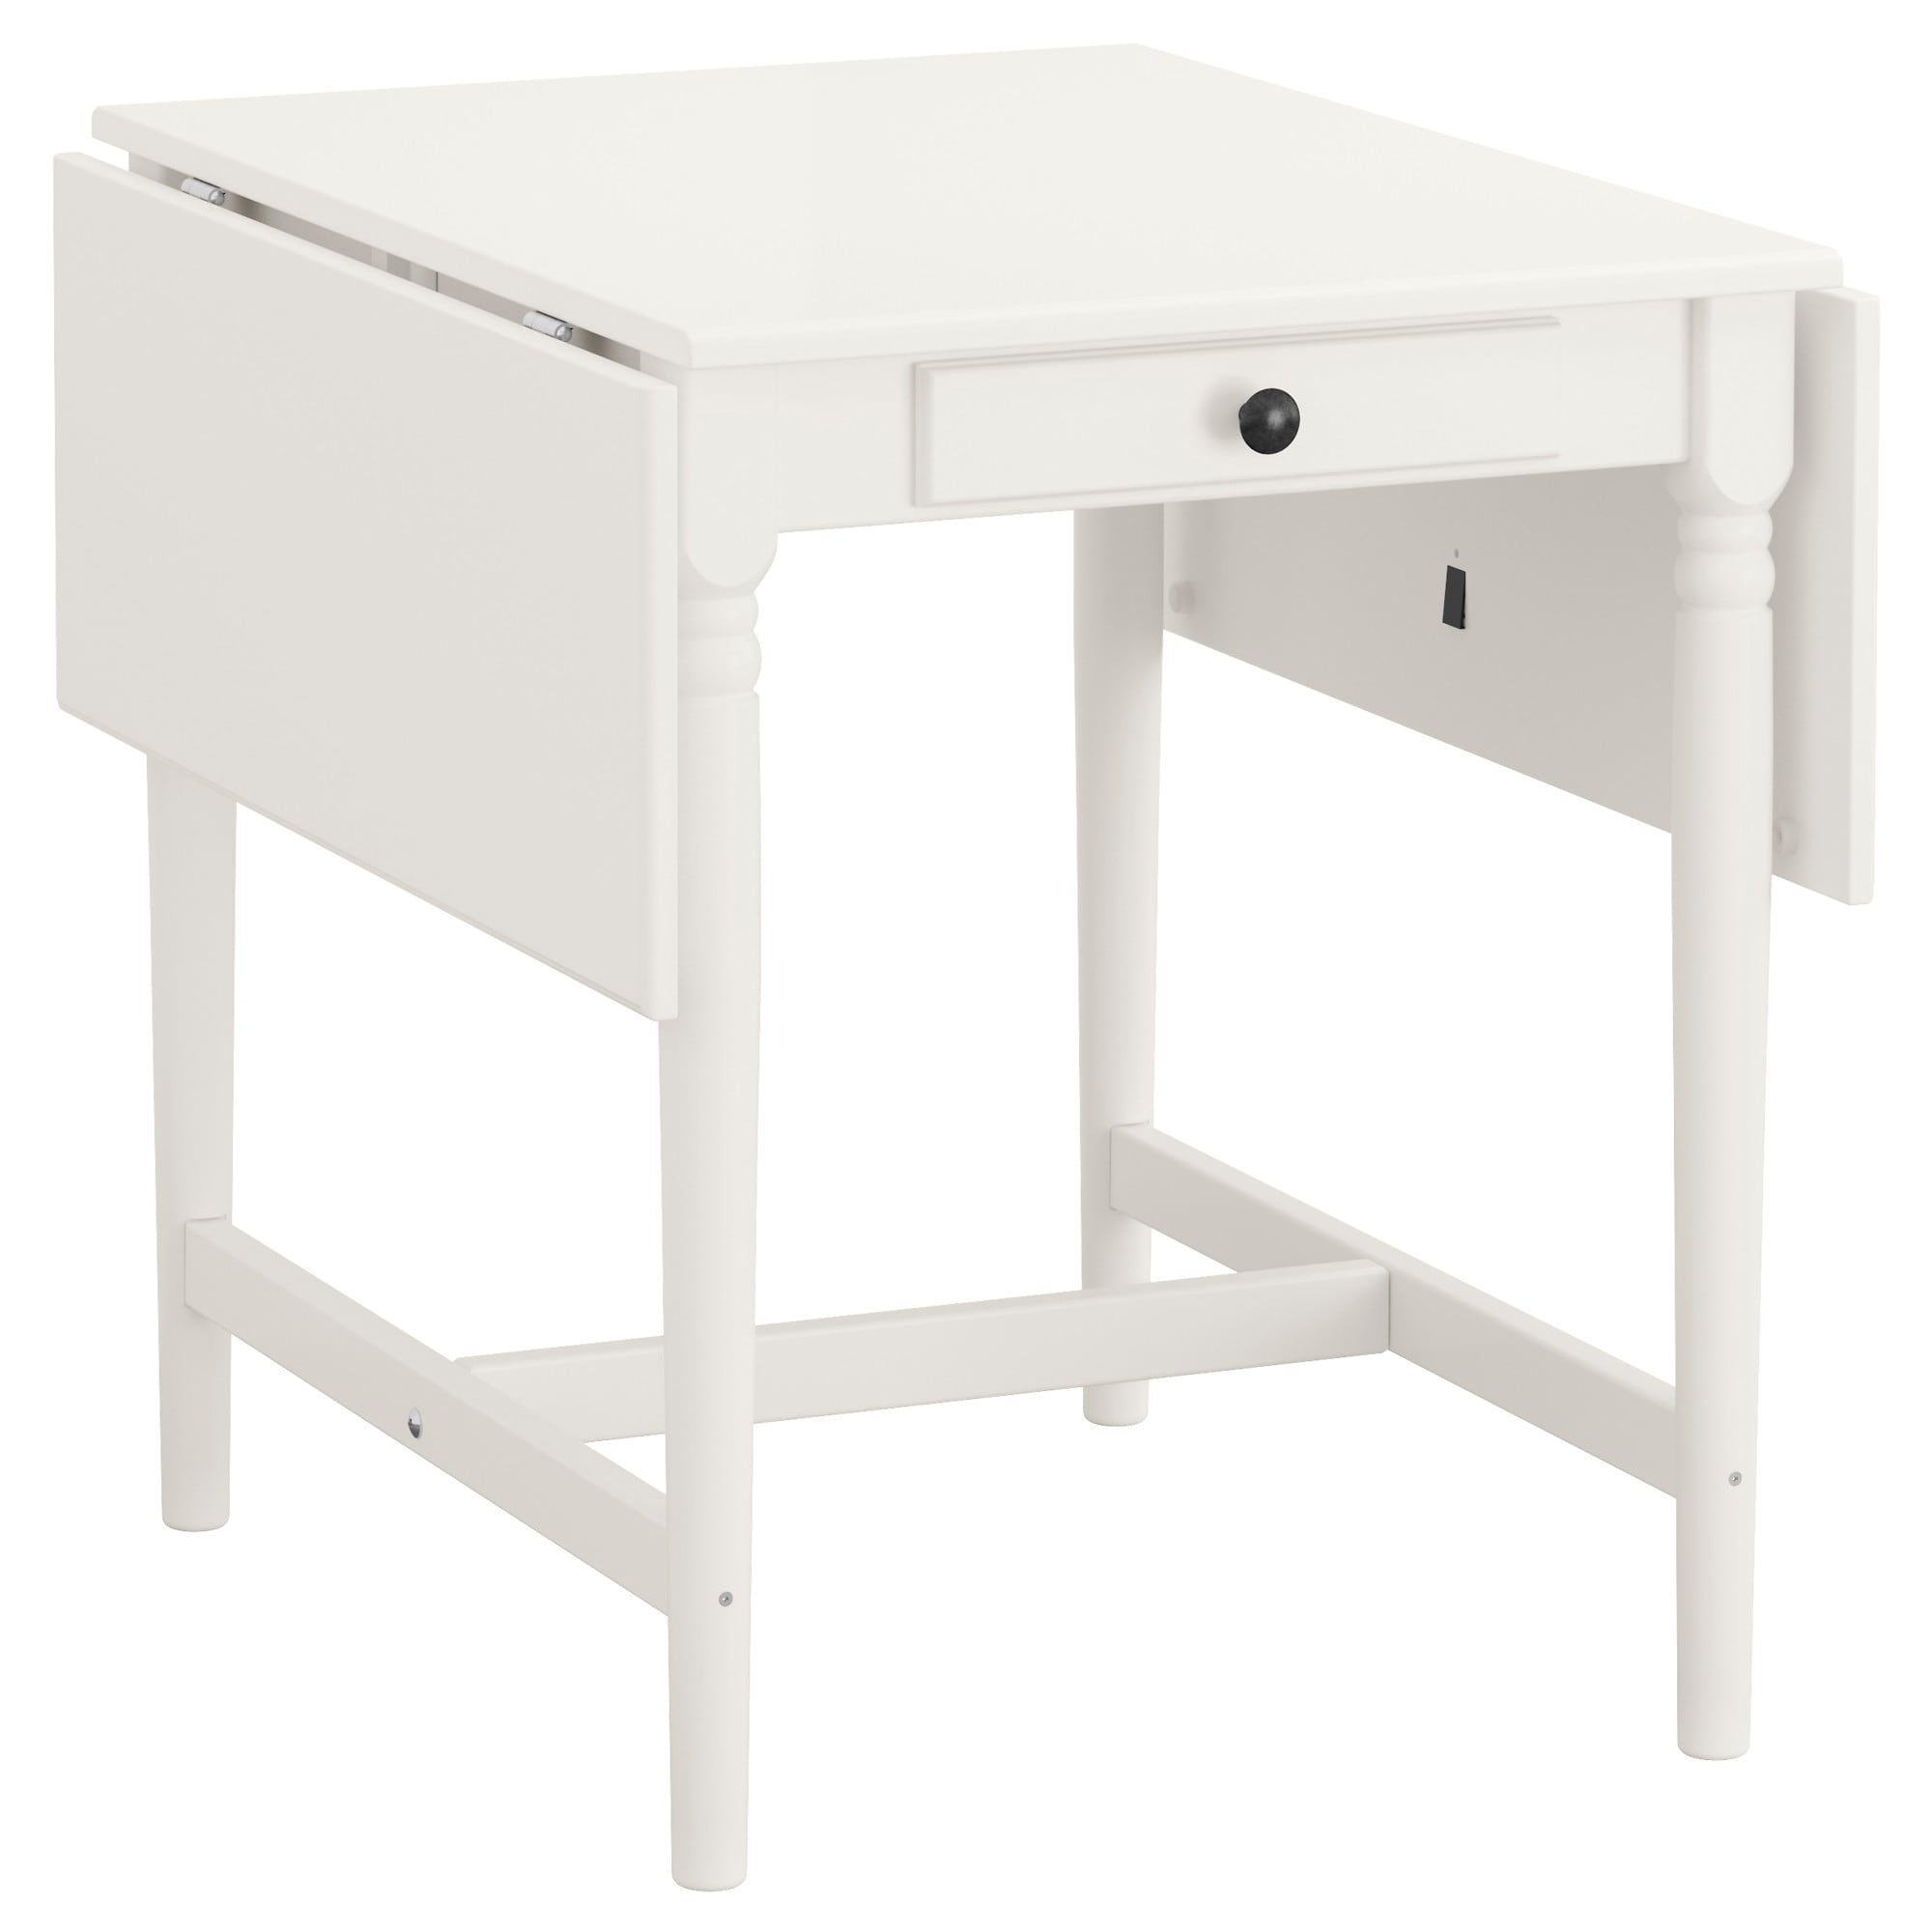 Mesas Extensibles Y Abatibles Para Salon Dddy Mesas Plegables Extensibles Pra Online Ikea